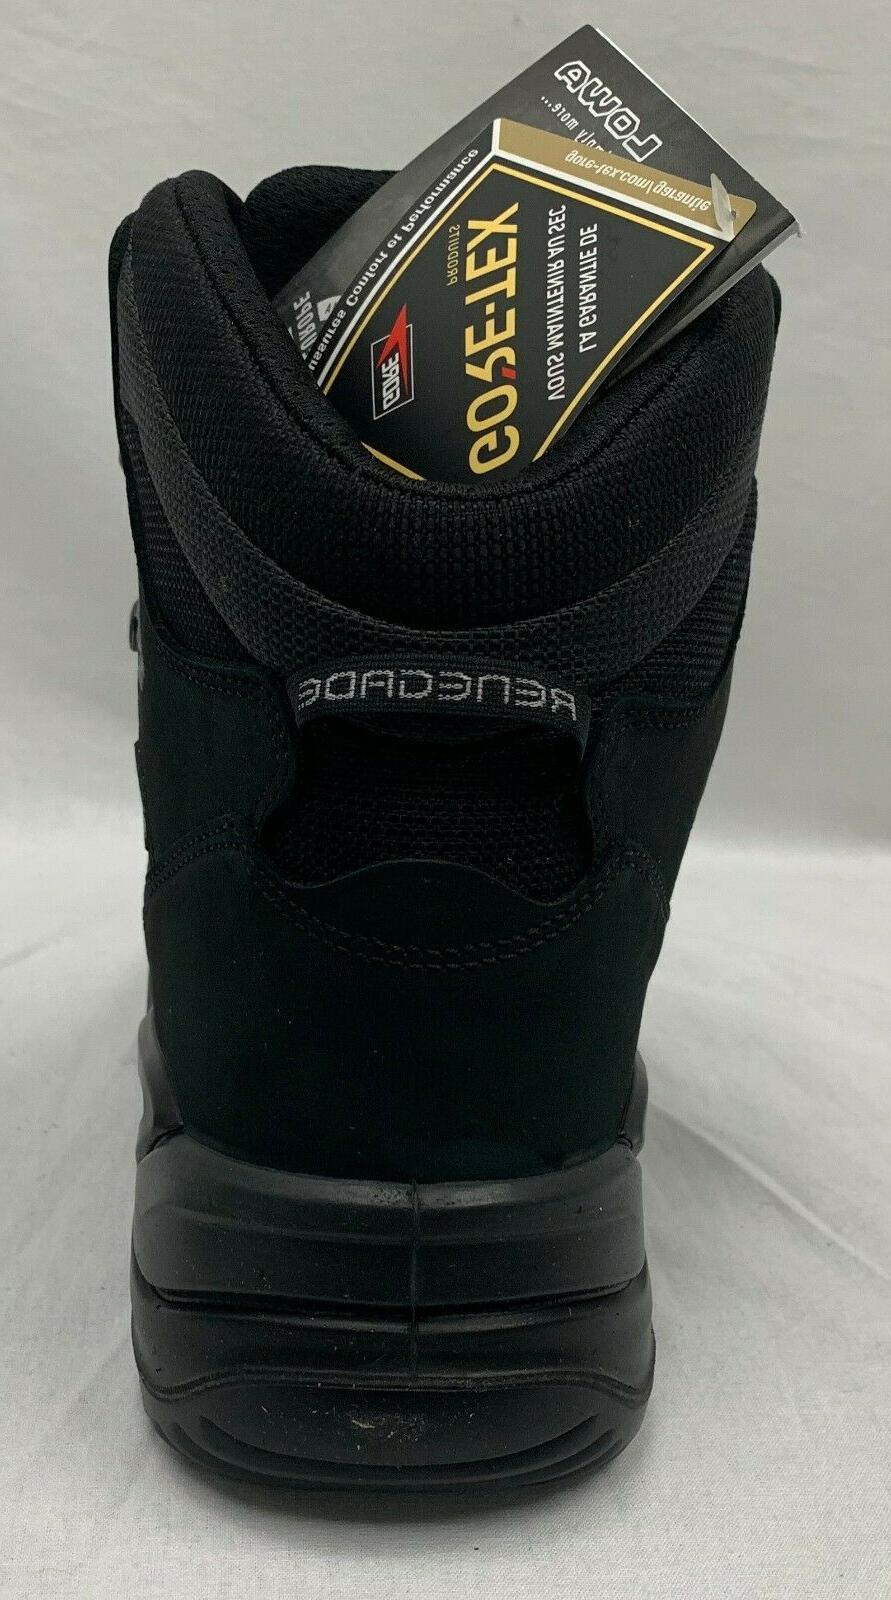 Lowa Mid boots 0998 size 8.5